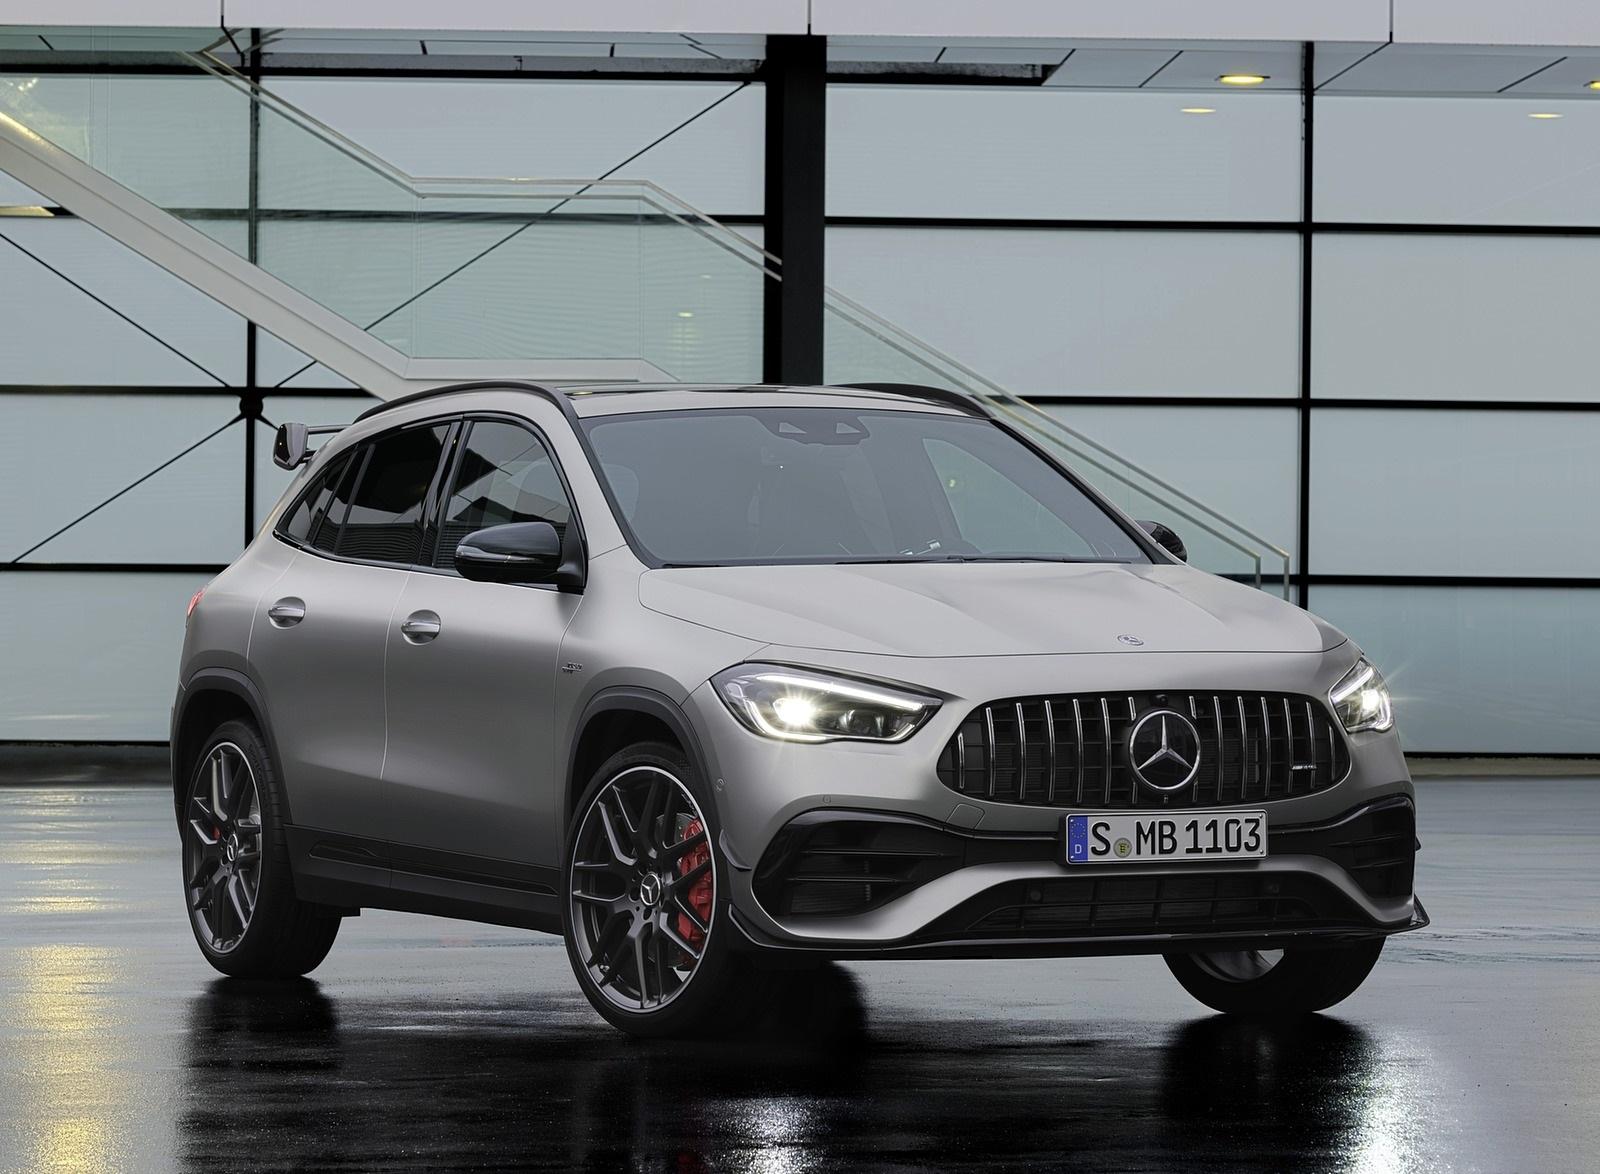 2021 Mercedes-AMG GLA 45 S 4MATIC+ (Color: Magno Grey) Front Three-Quarter Wallpapers (10)